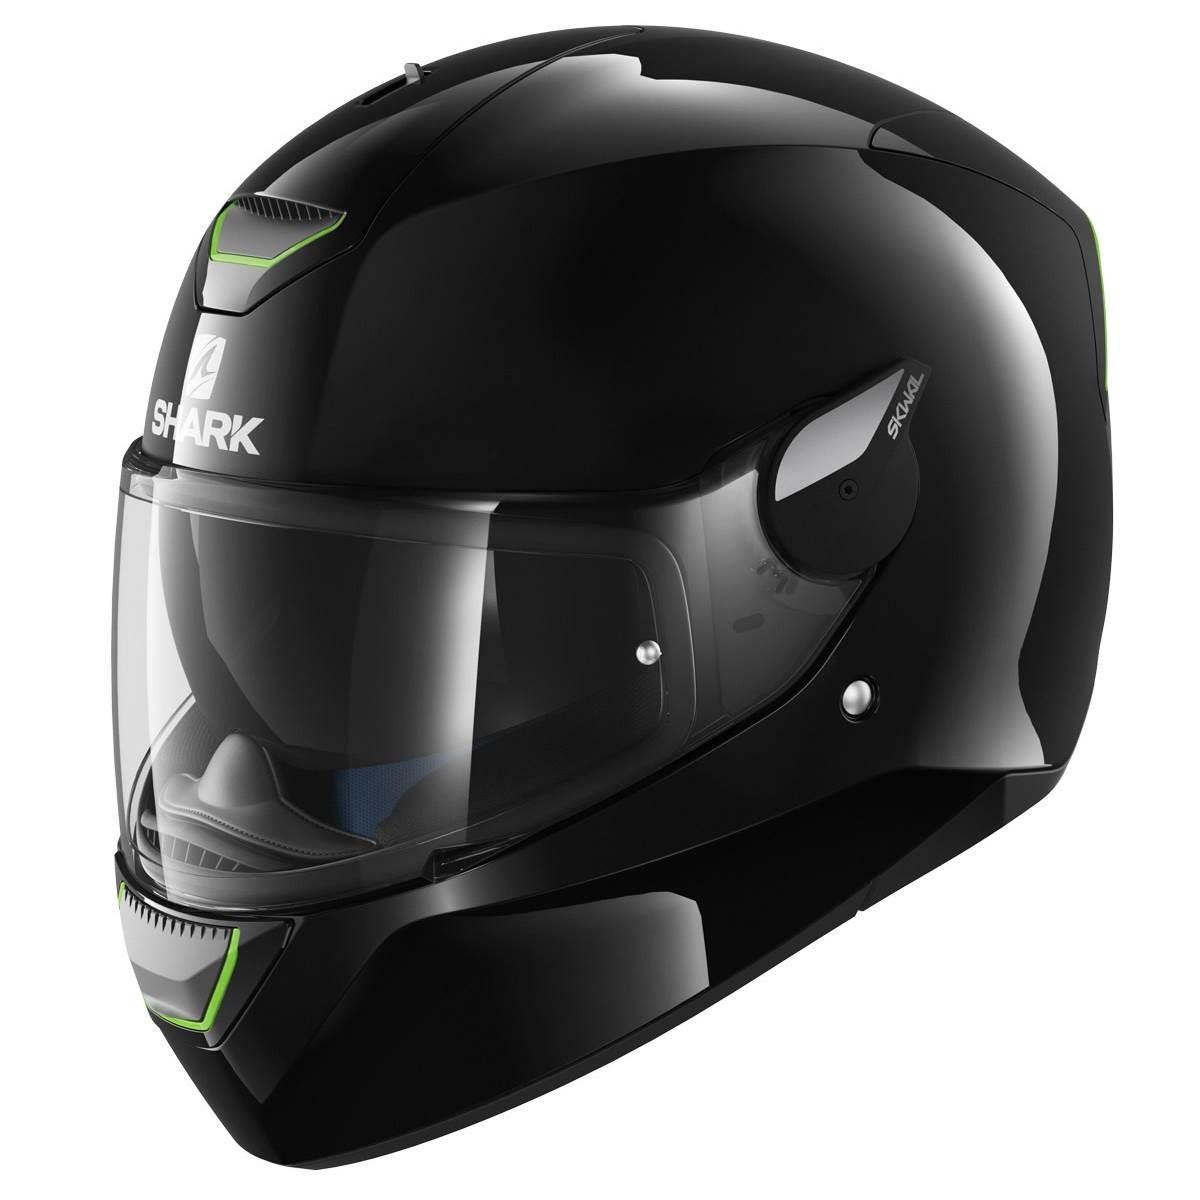 Shark Skwal Blank Black Motorcycle Helmet Built In Lighting Pinlock Insert Ebay